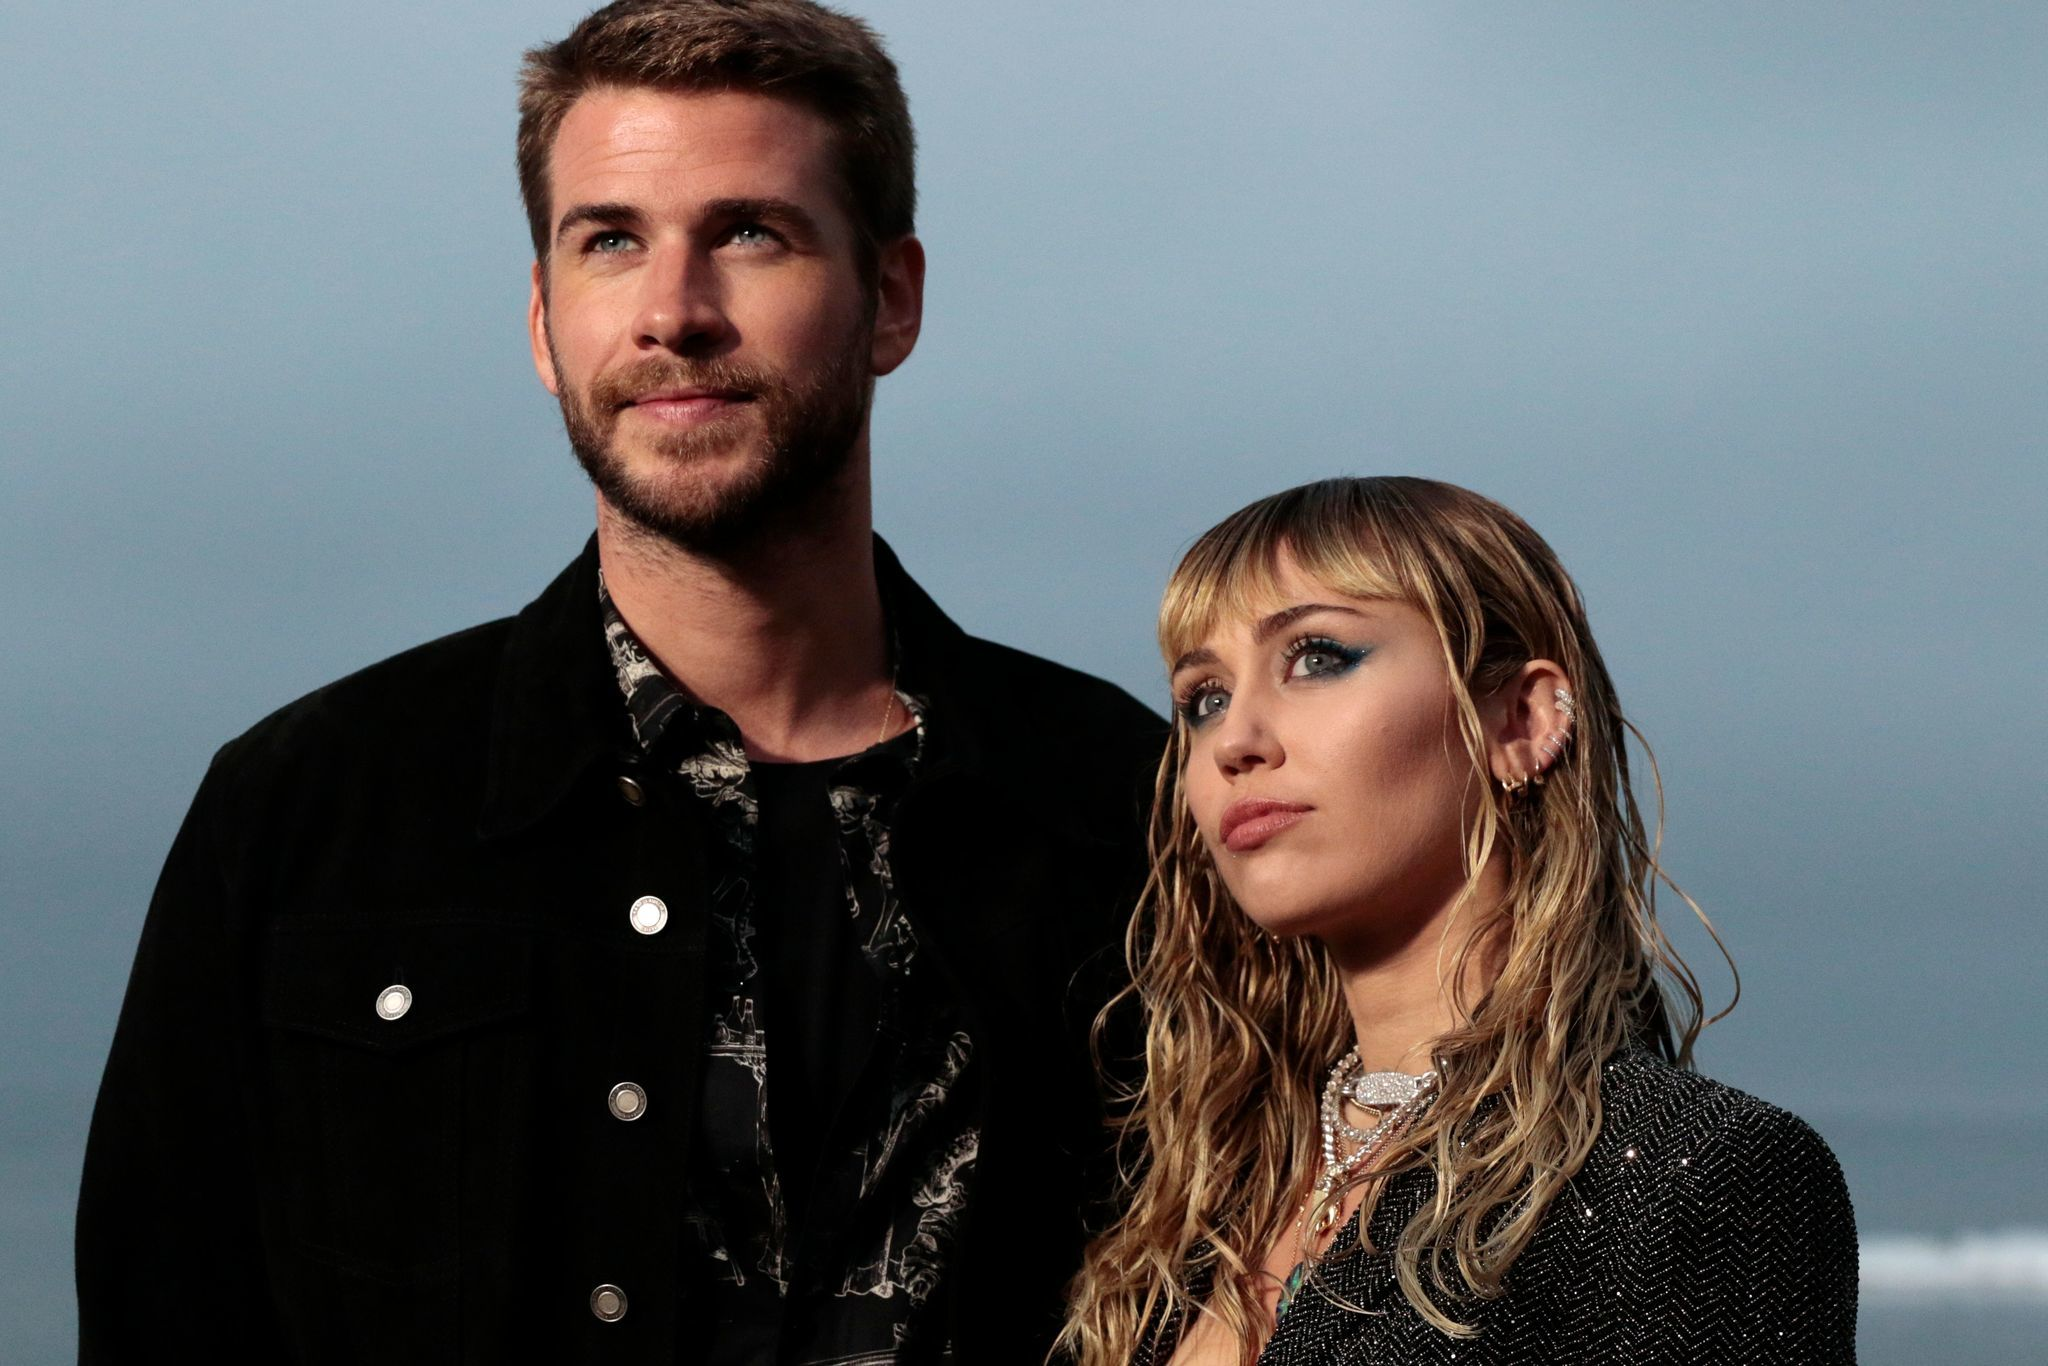 Miley Cyrus shows off 'freedom' tattoo following split from Liam Hemsworth